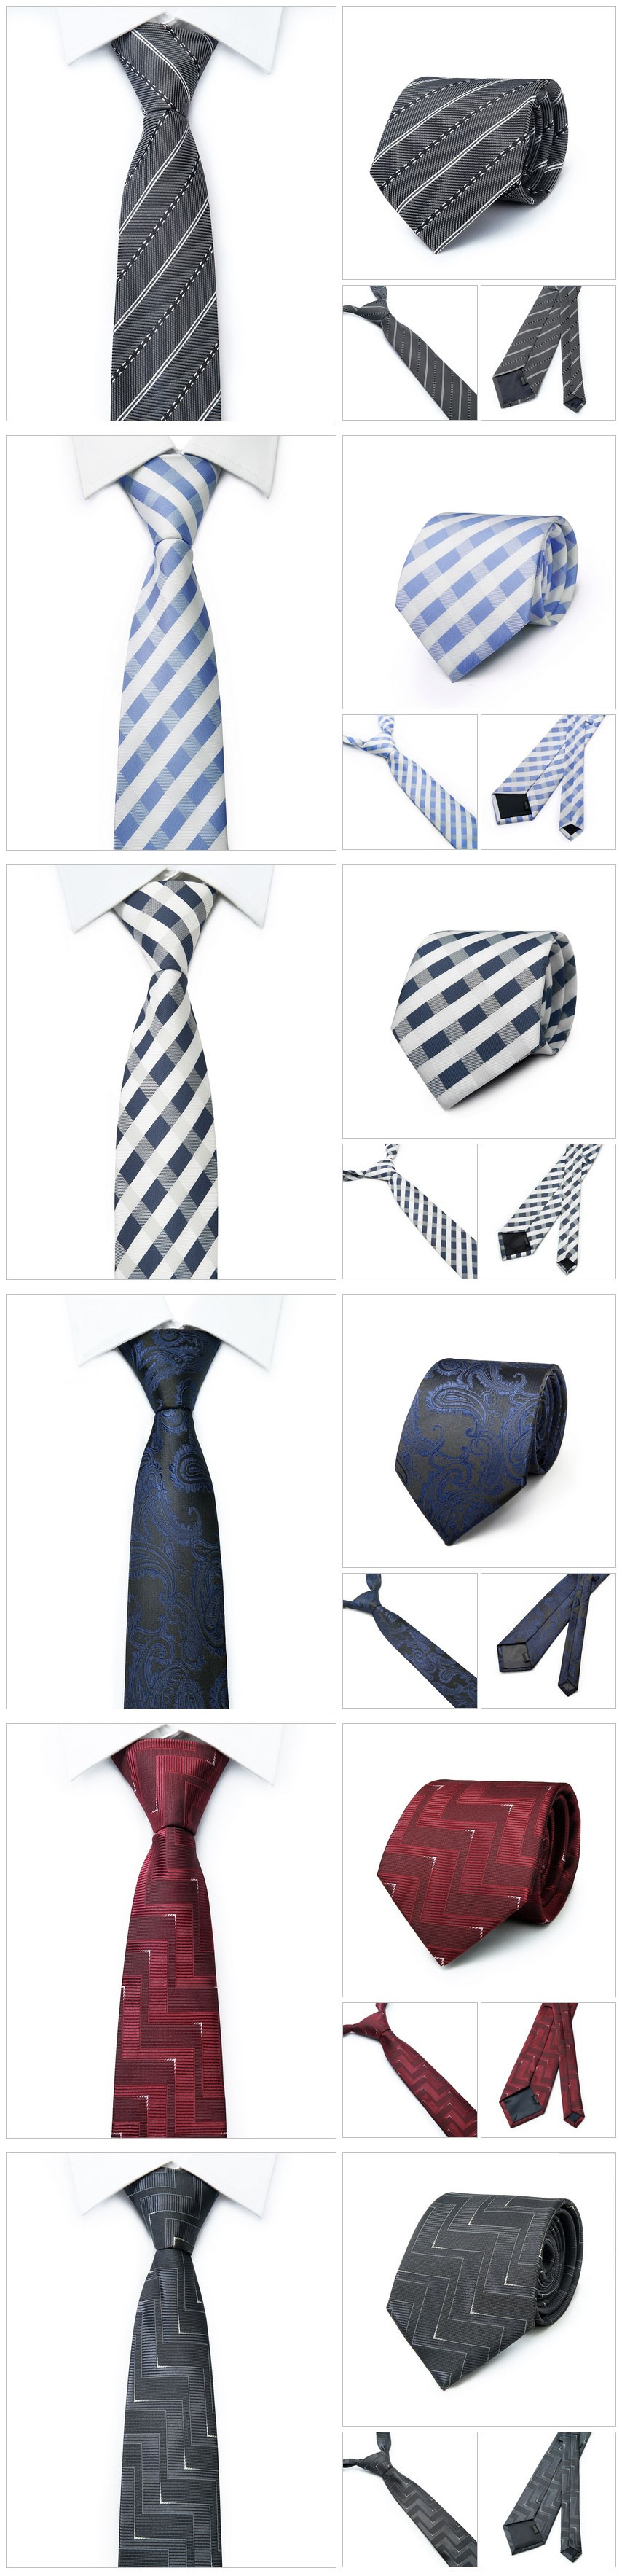 805e5c665768 2015 Business Tie men 100% Silk brue striped Necktie man Diamond ties  gravatas corbatas for men Formal Wedding Party Neck tie